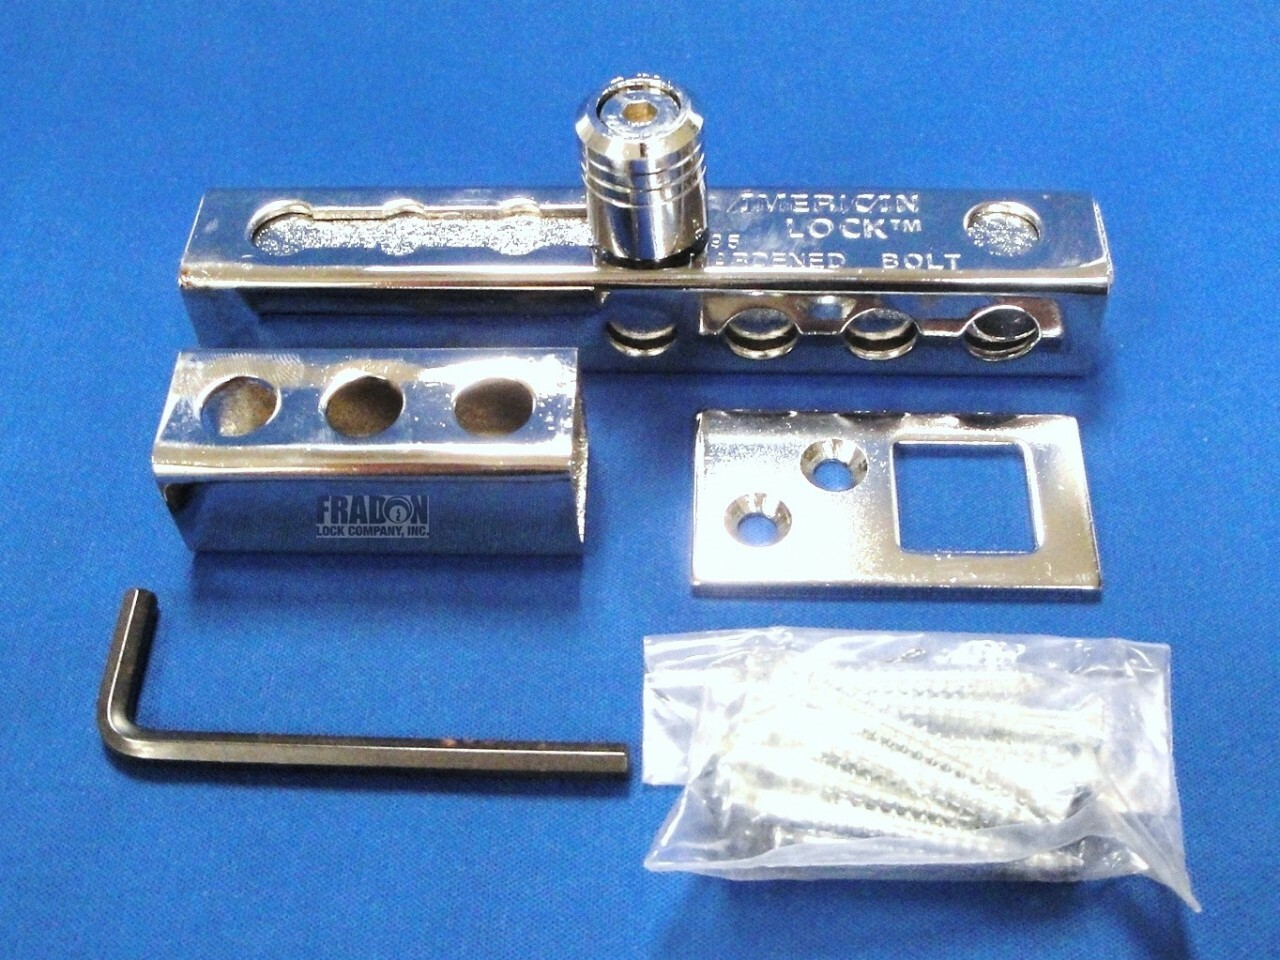 American Lock A895 High Security Hasp Bolt Ez 000848